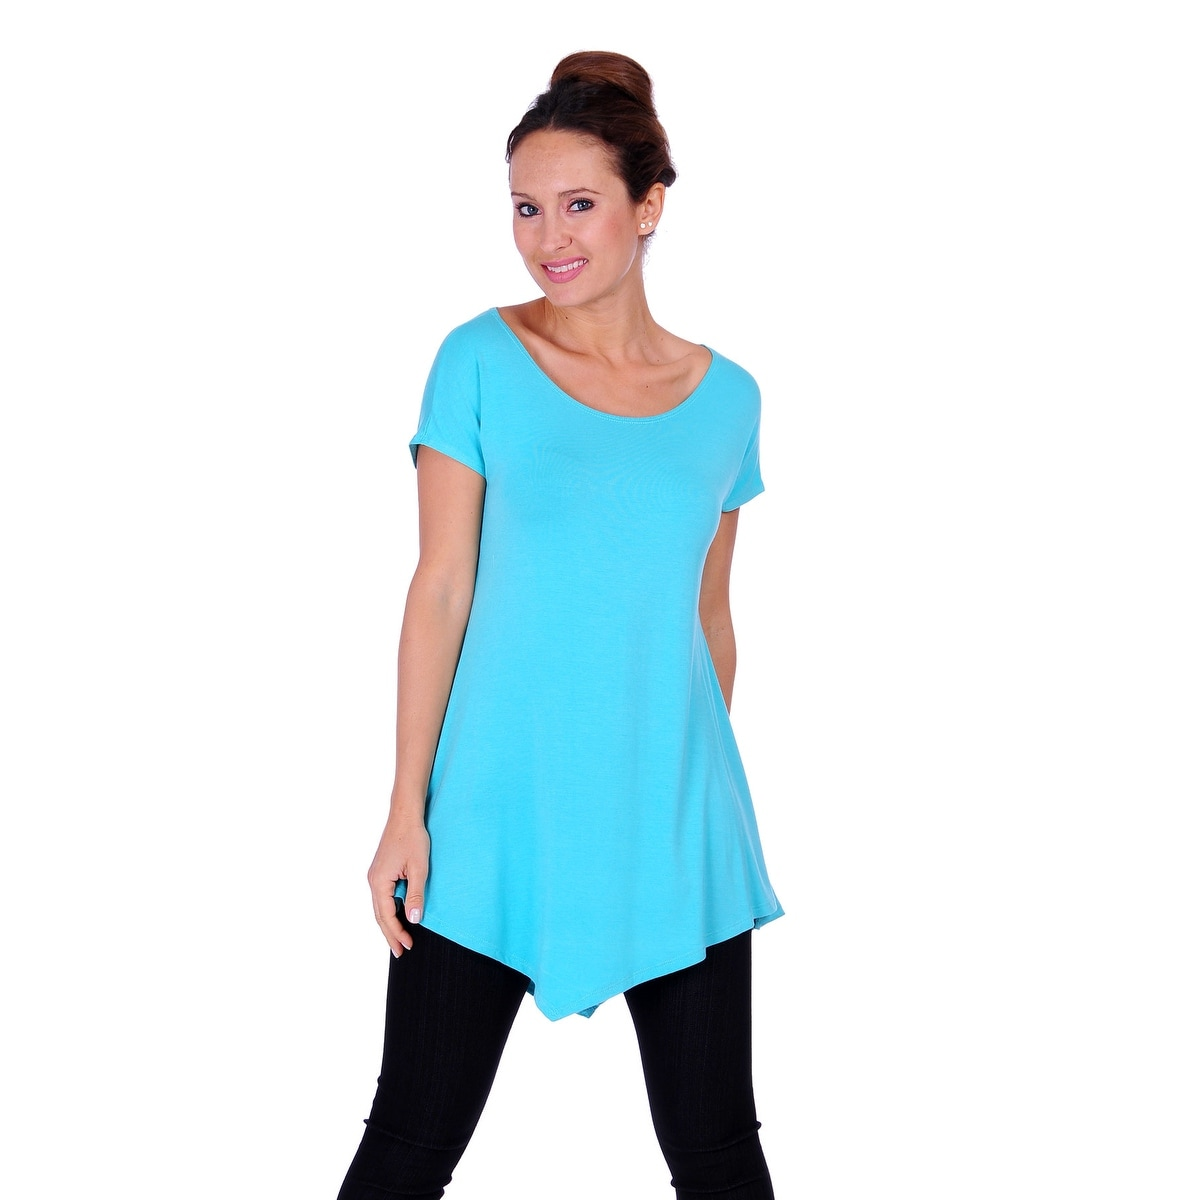 Simply Ravishing Women's Assymetrical Front/Back Handkerchief Hem Sleeveless Tunic Top - Thumbnail 7